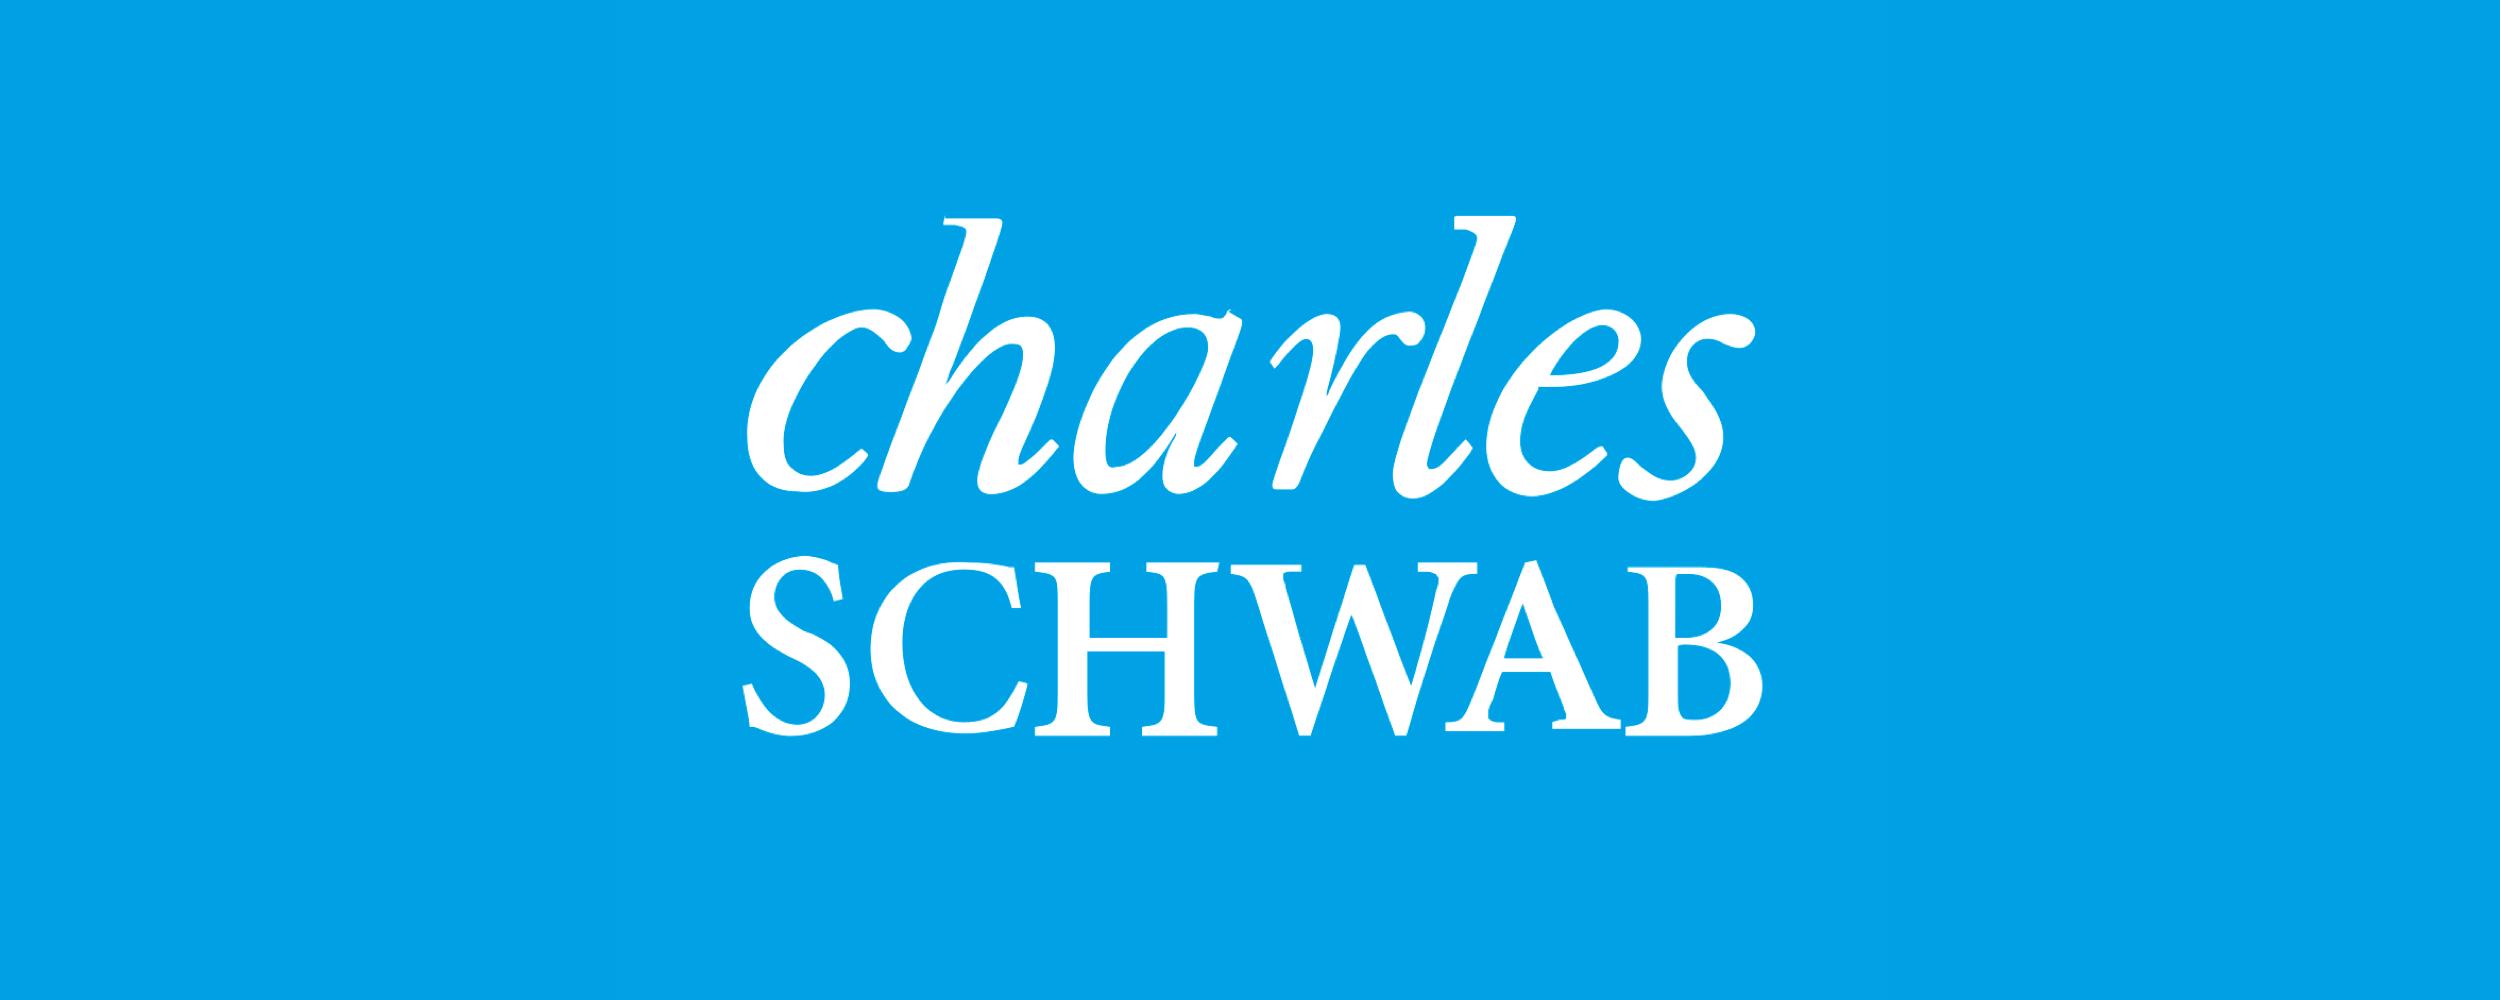 Charles Scwab